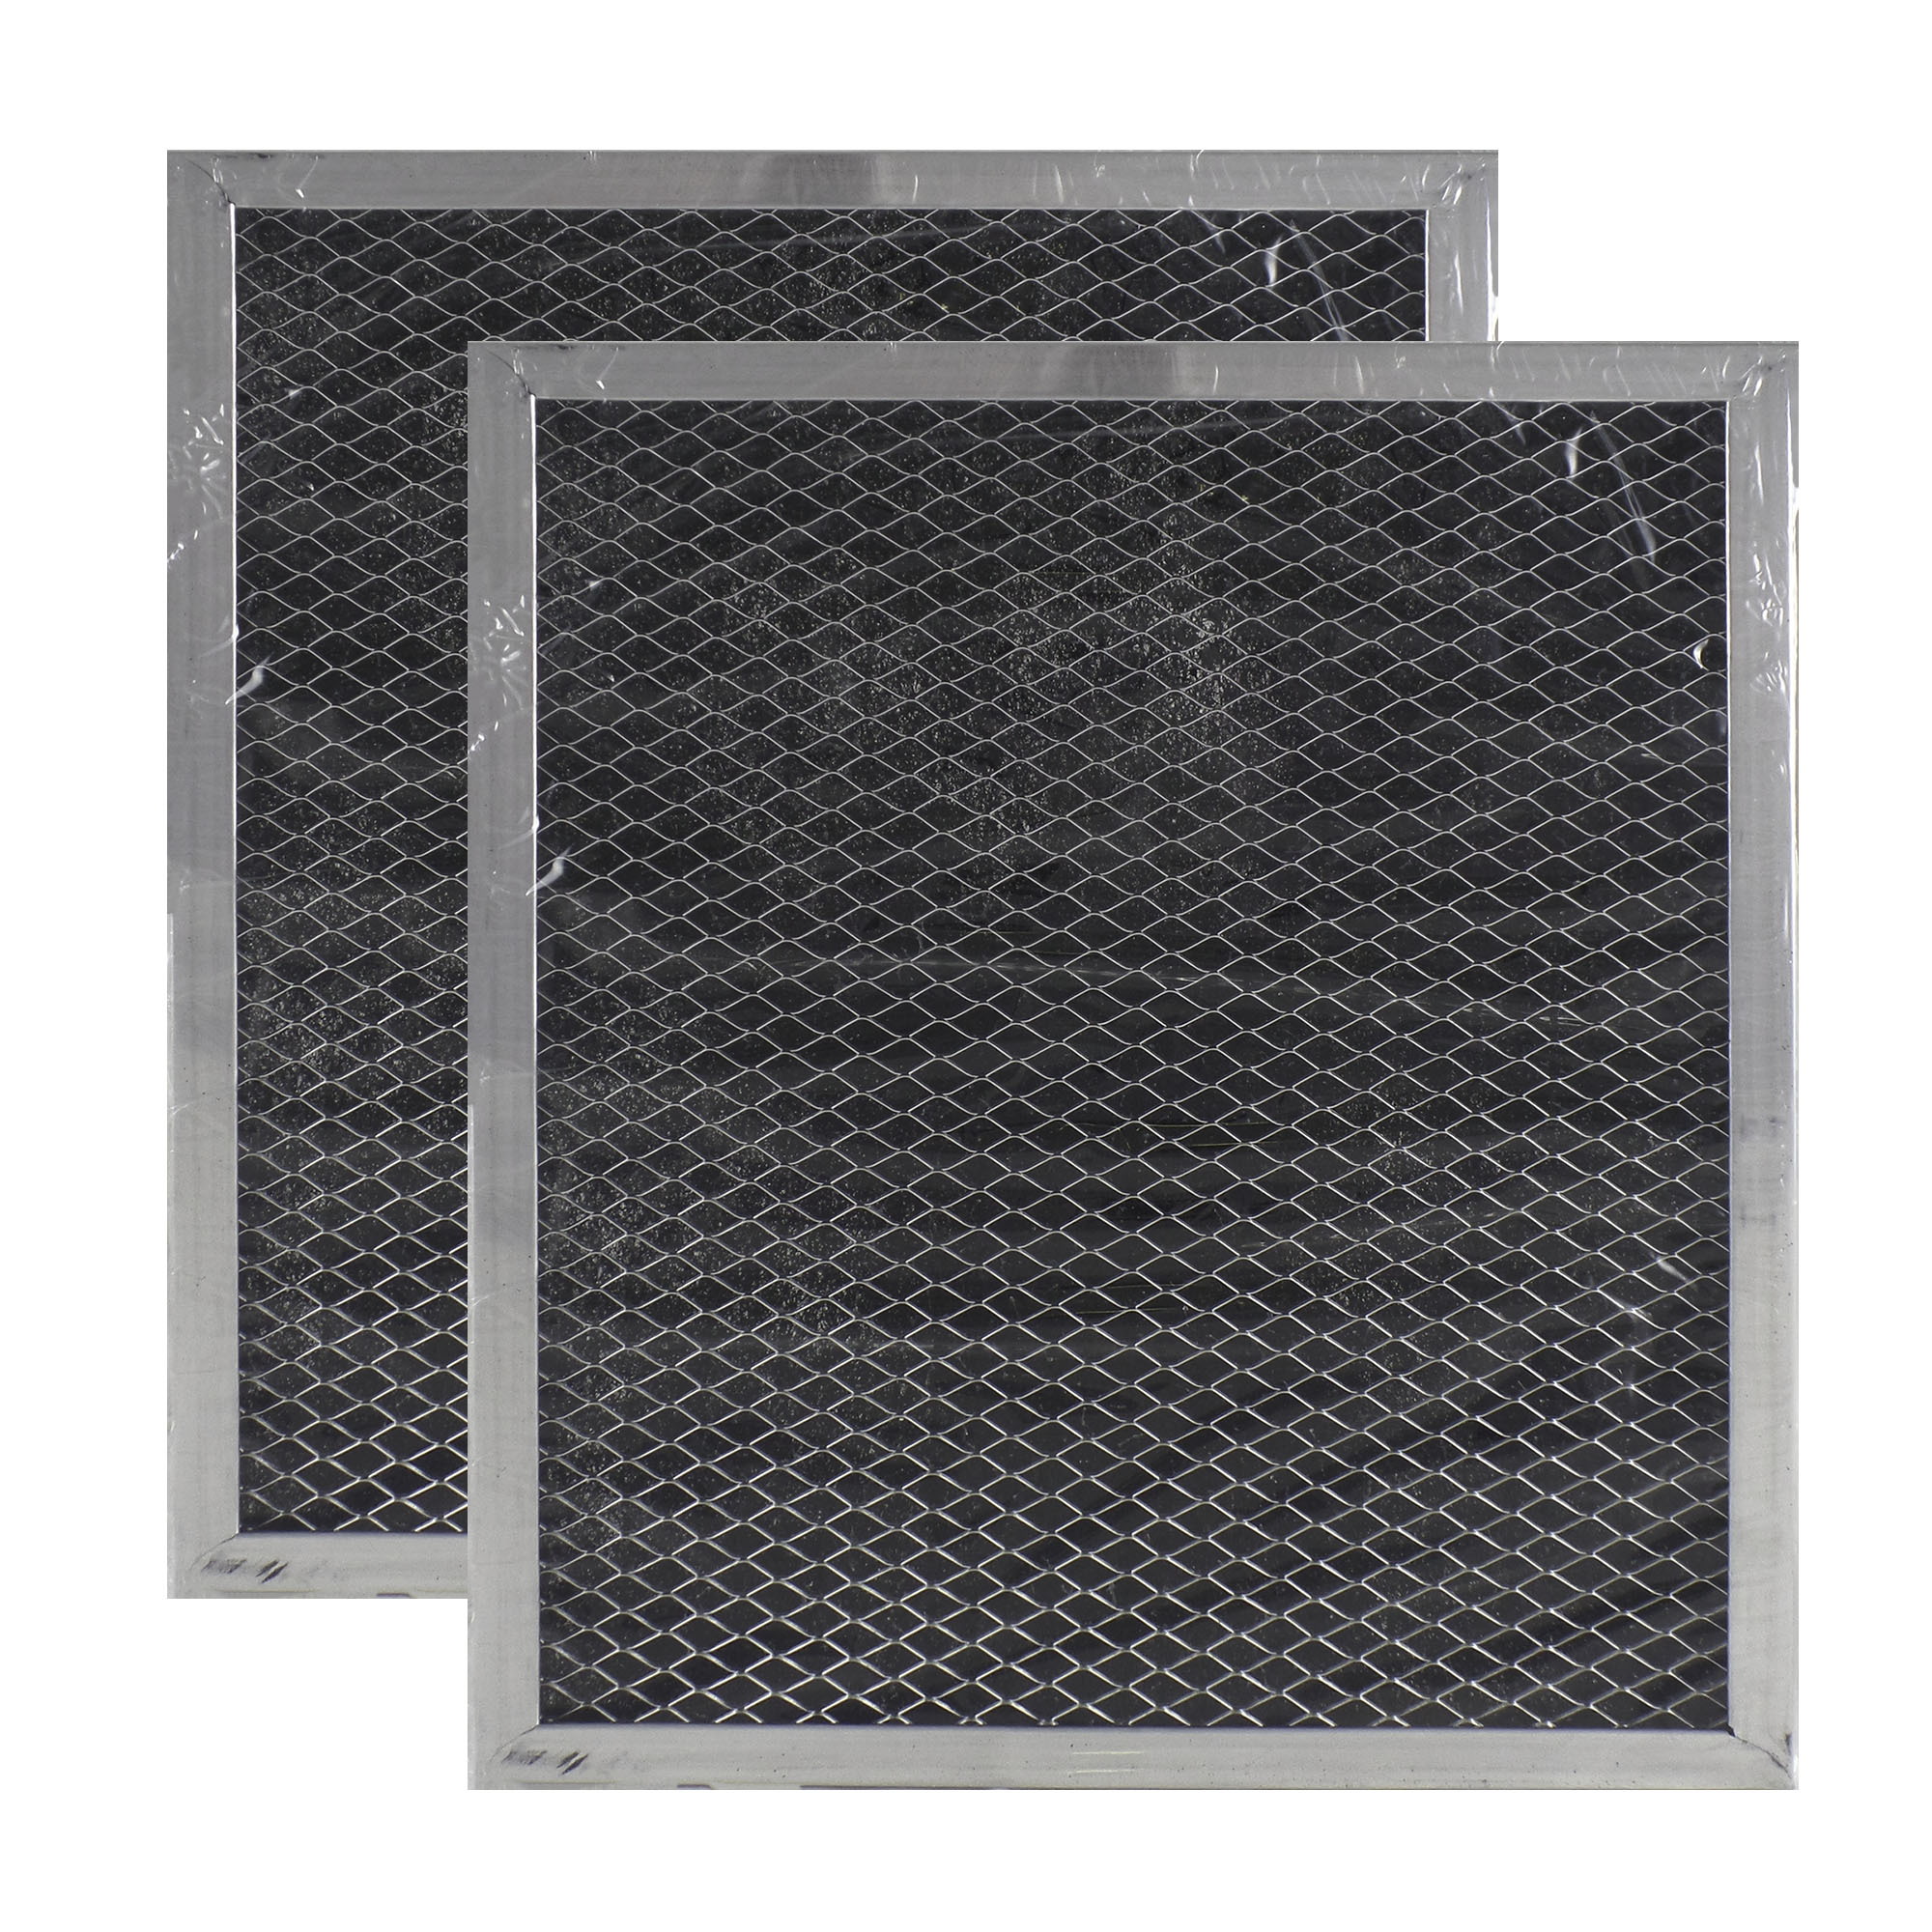 "Range Hood Filter 2 NEW 9/"" x 10.5/"" x 1//8/"" Grease Type"